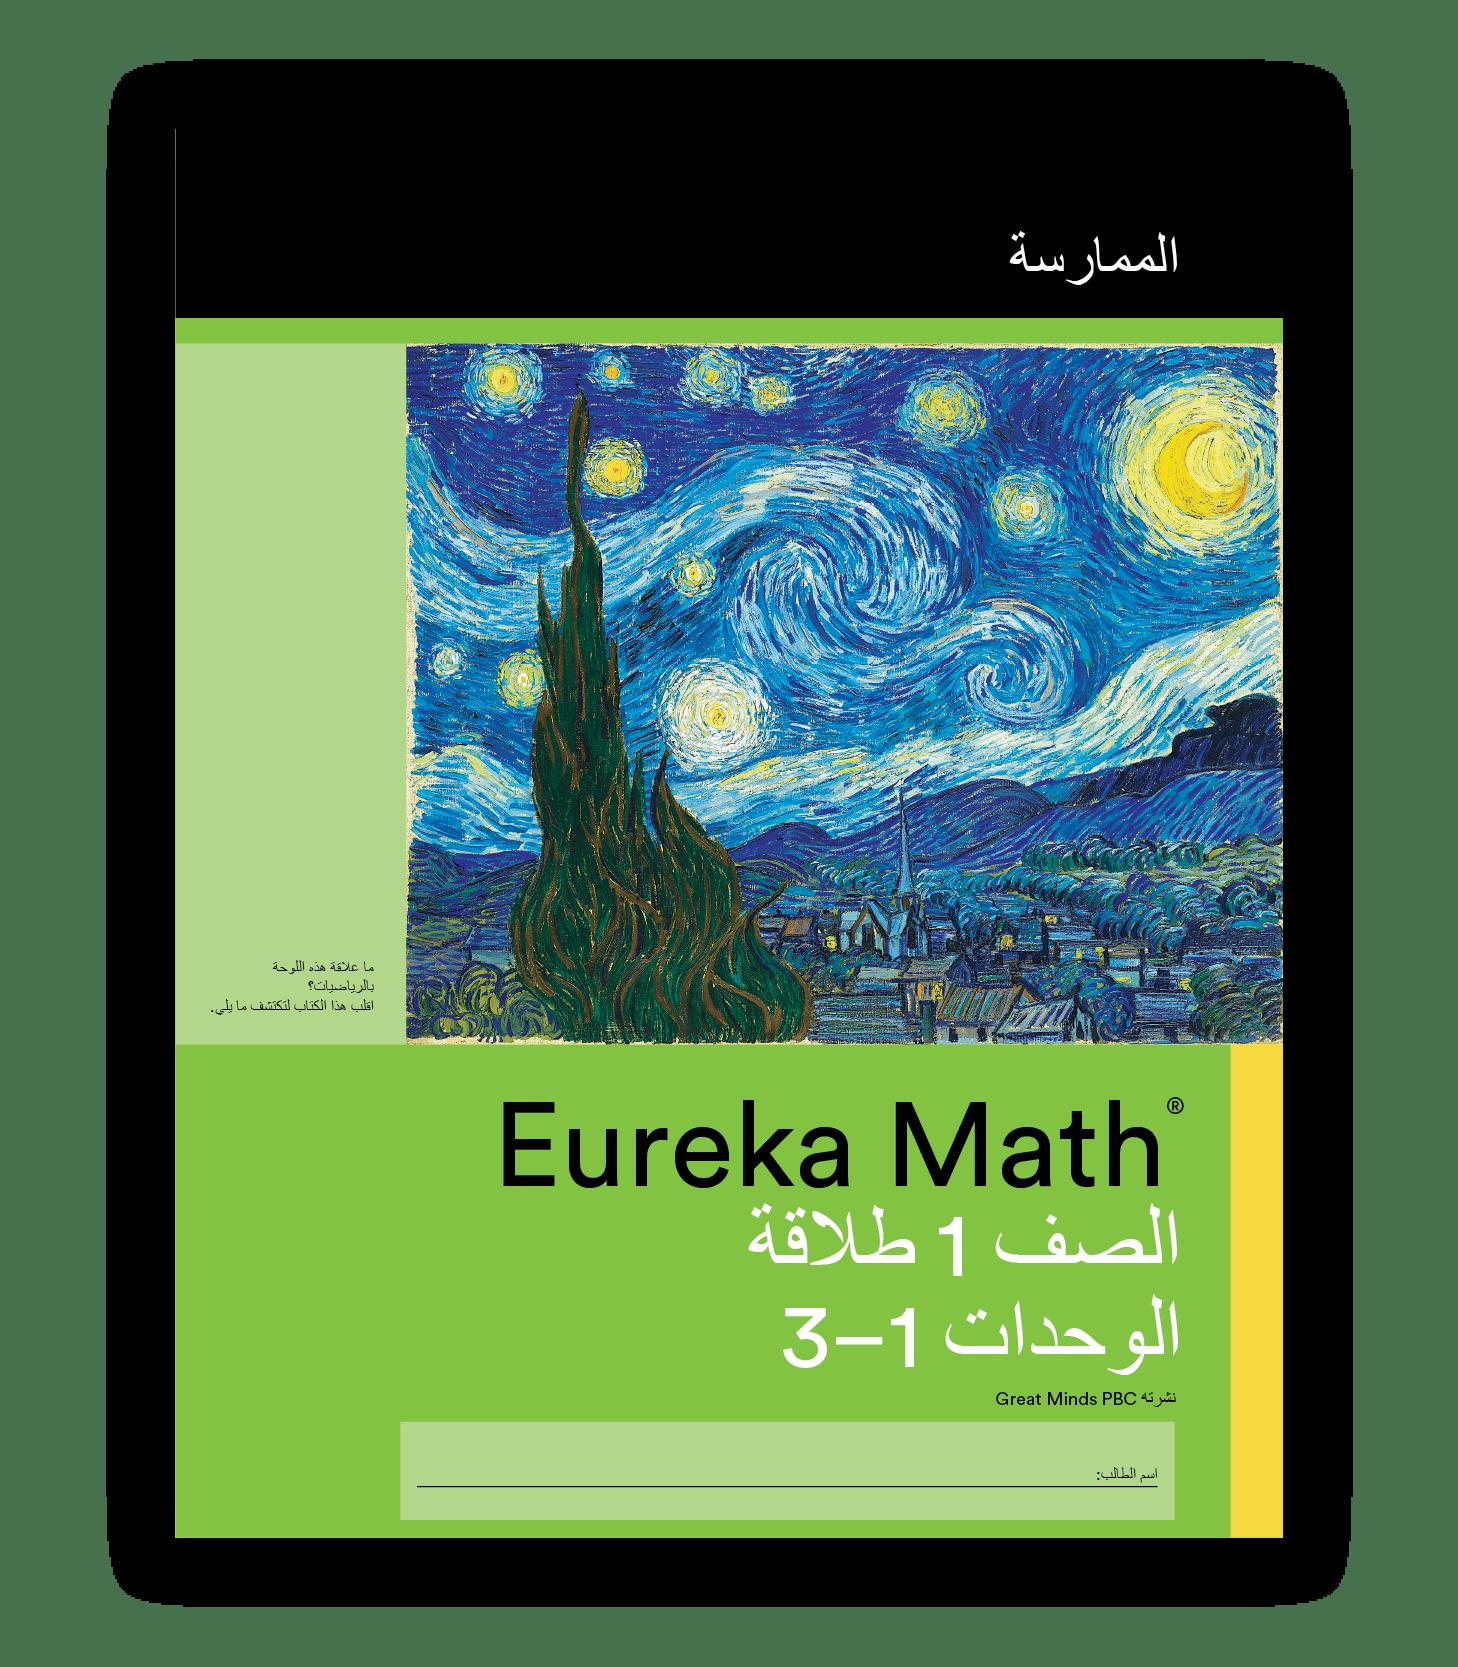 Eureka Math Practice Book in Arabic for Grade 1